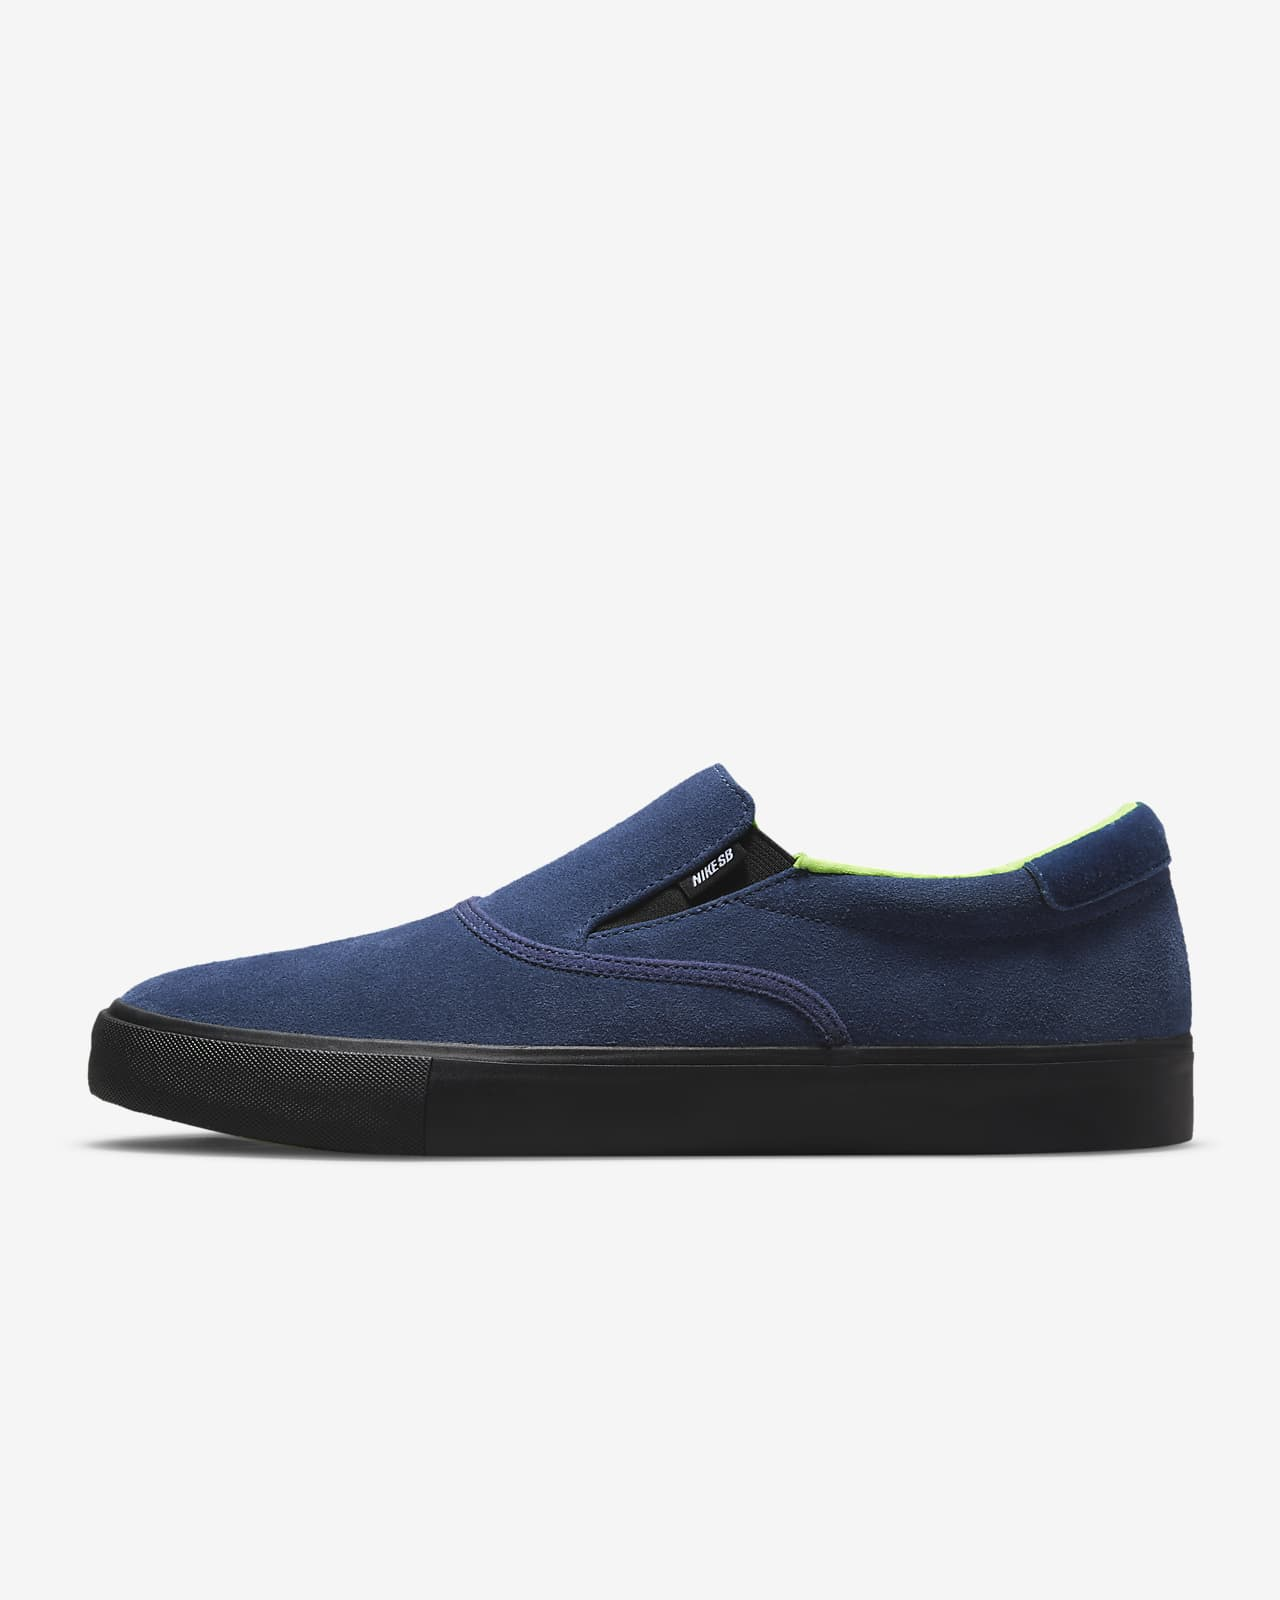 Nike SB Zoom Verona Slip x Leo Baker Skateschoen